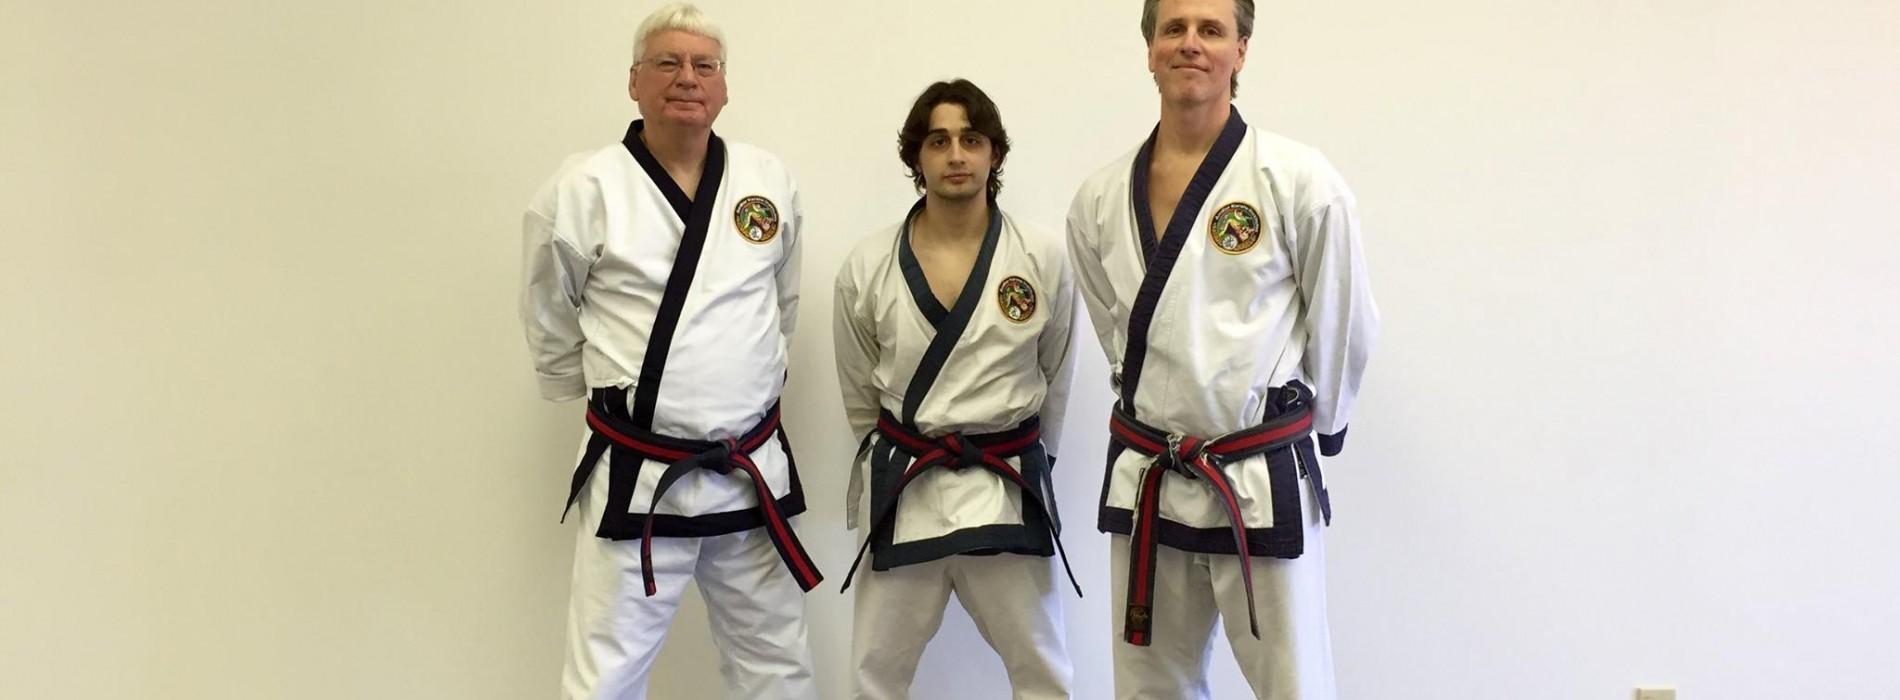 AmKor Karate Paoli Pennsylvania